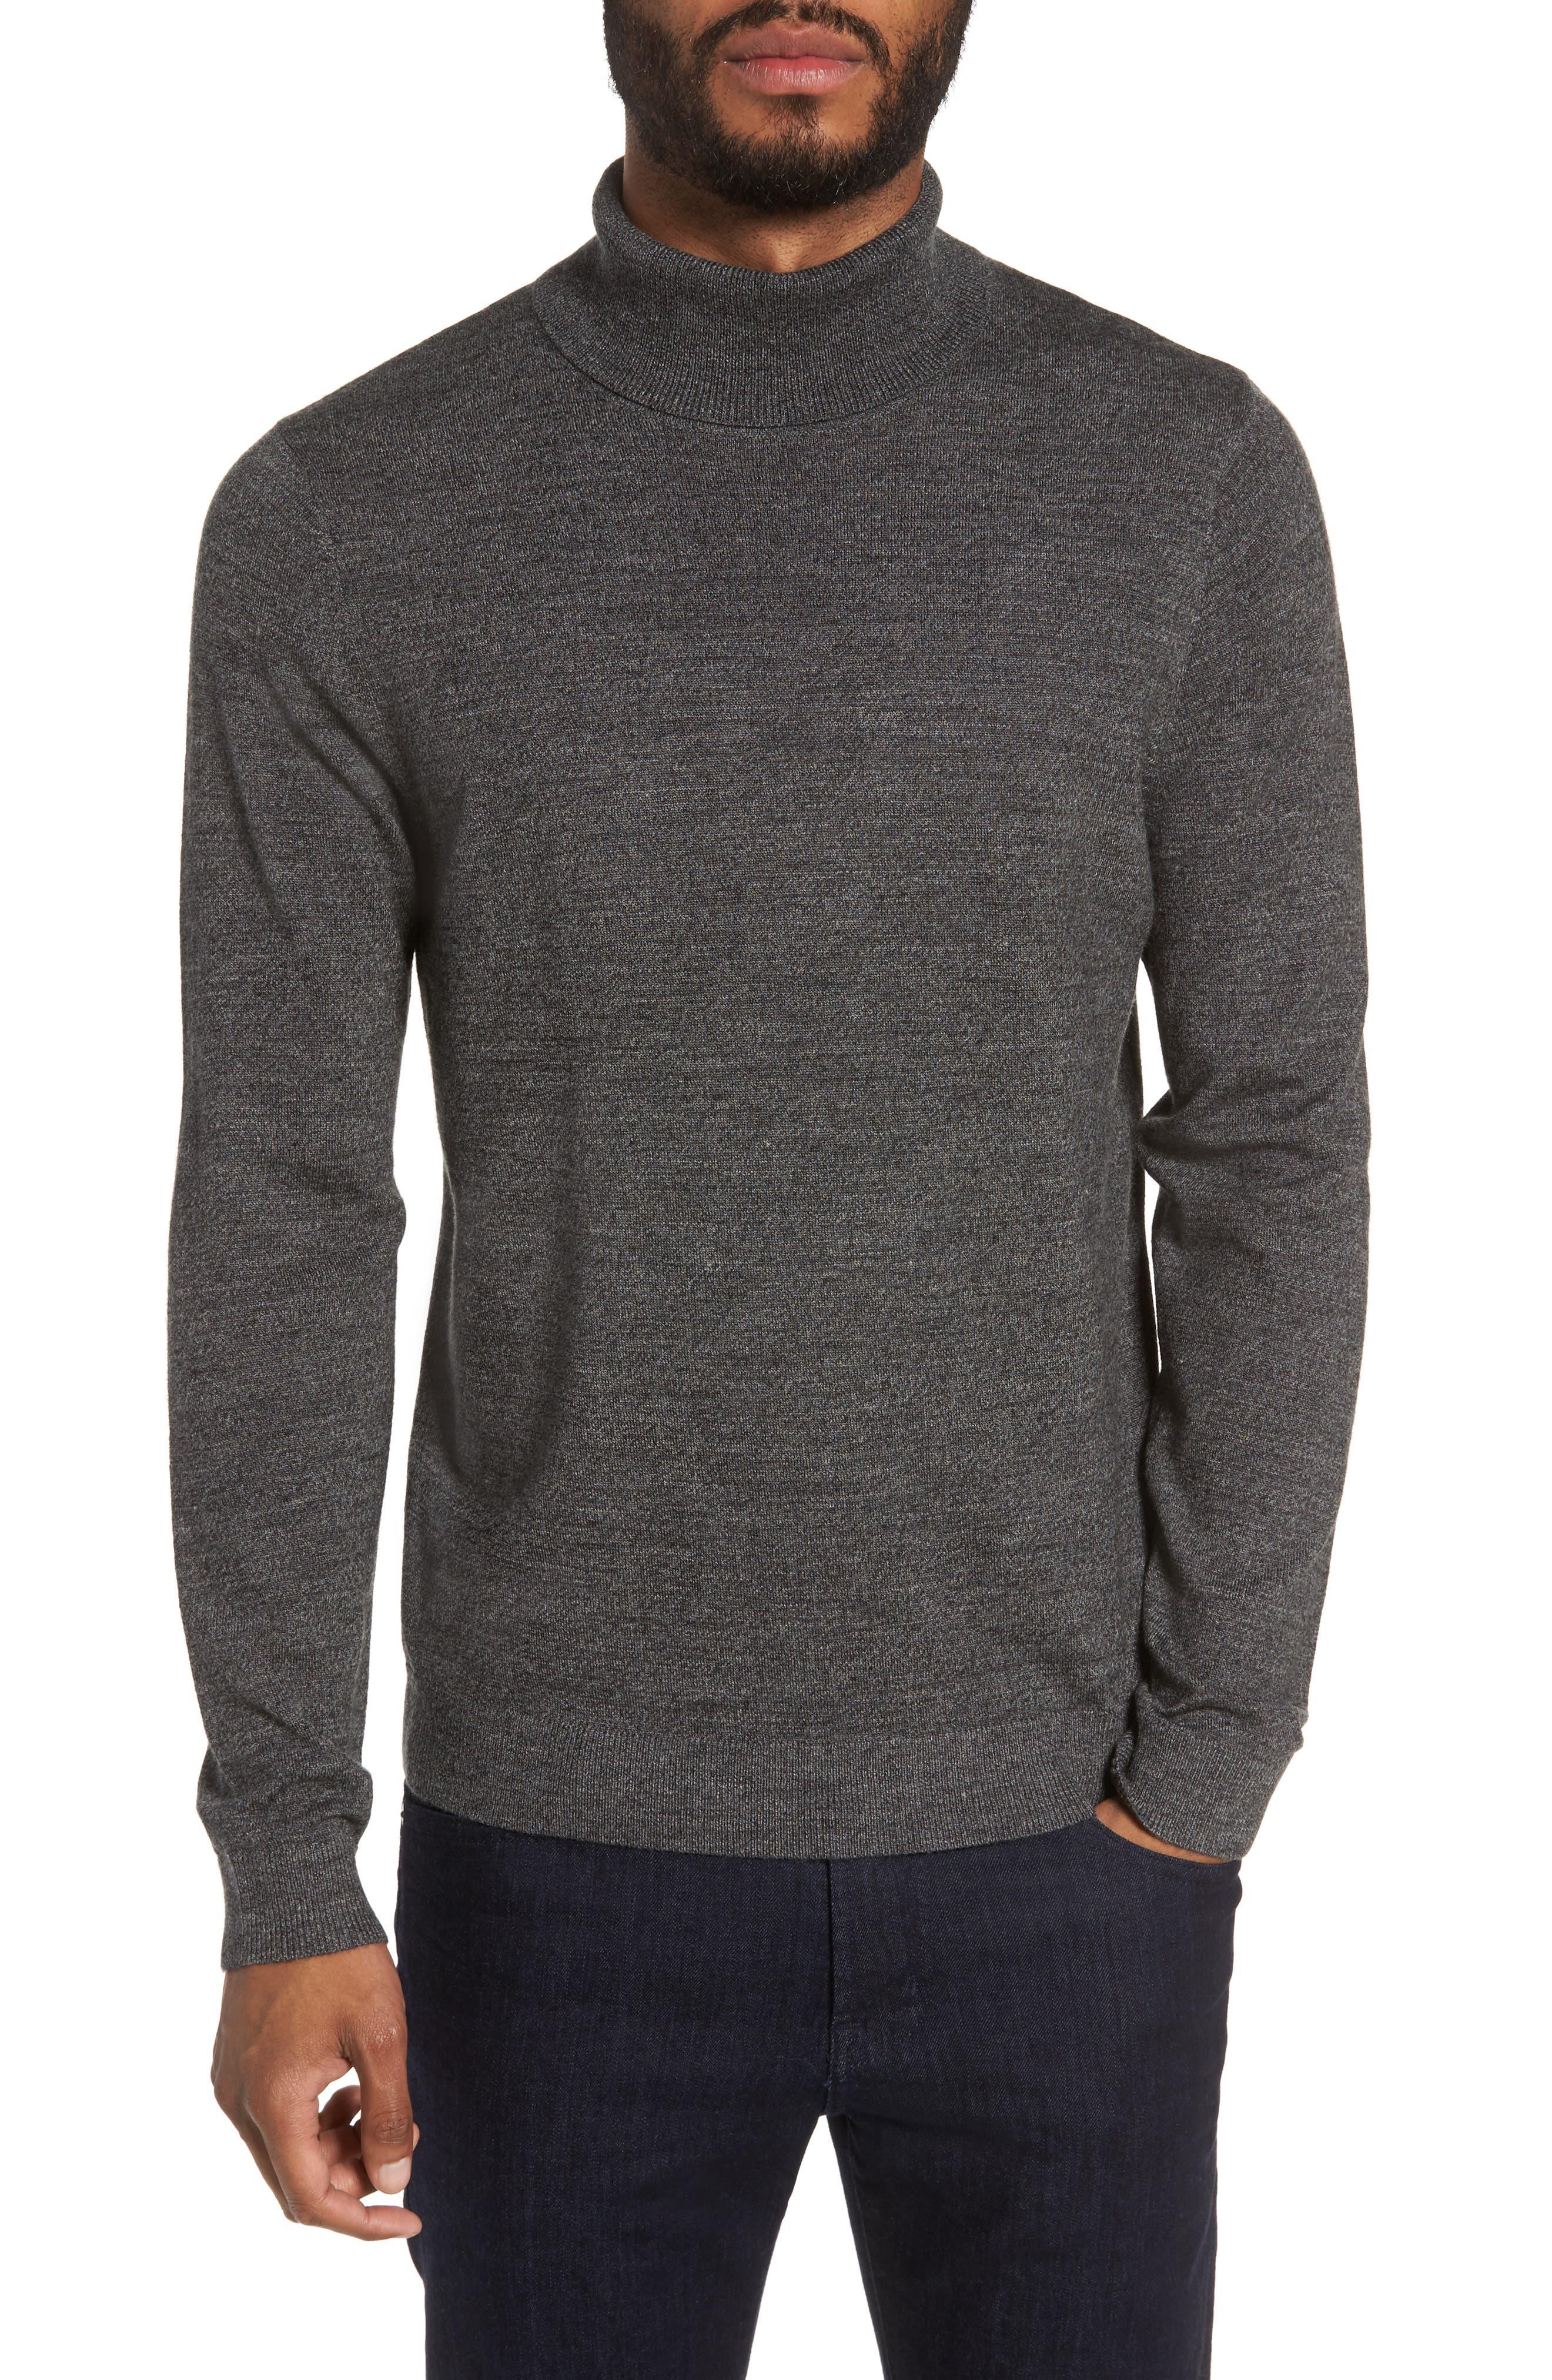 Calibrate Turtleneck Sweater